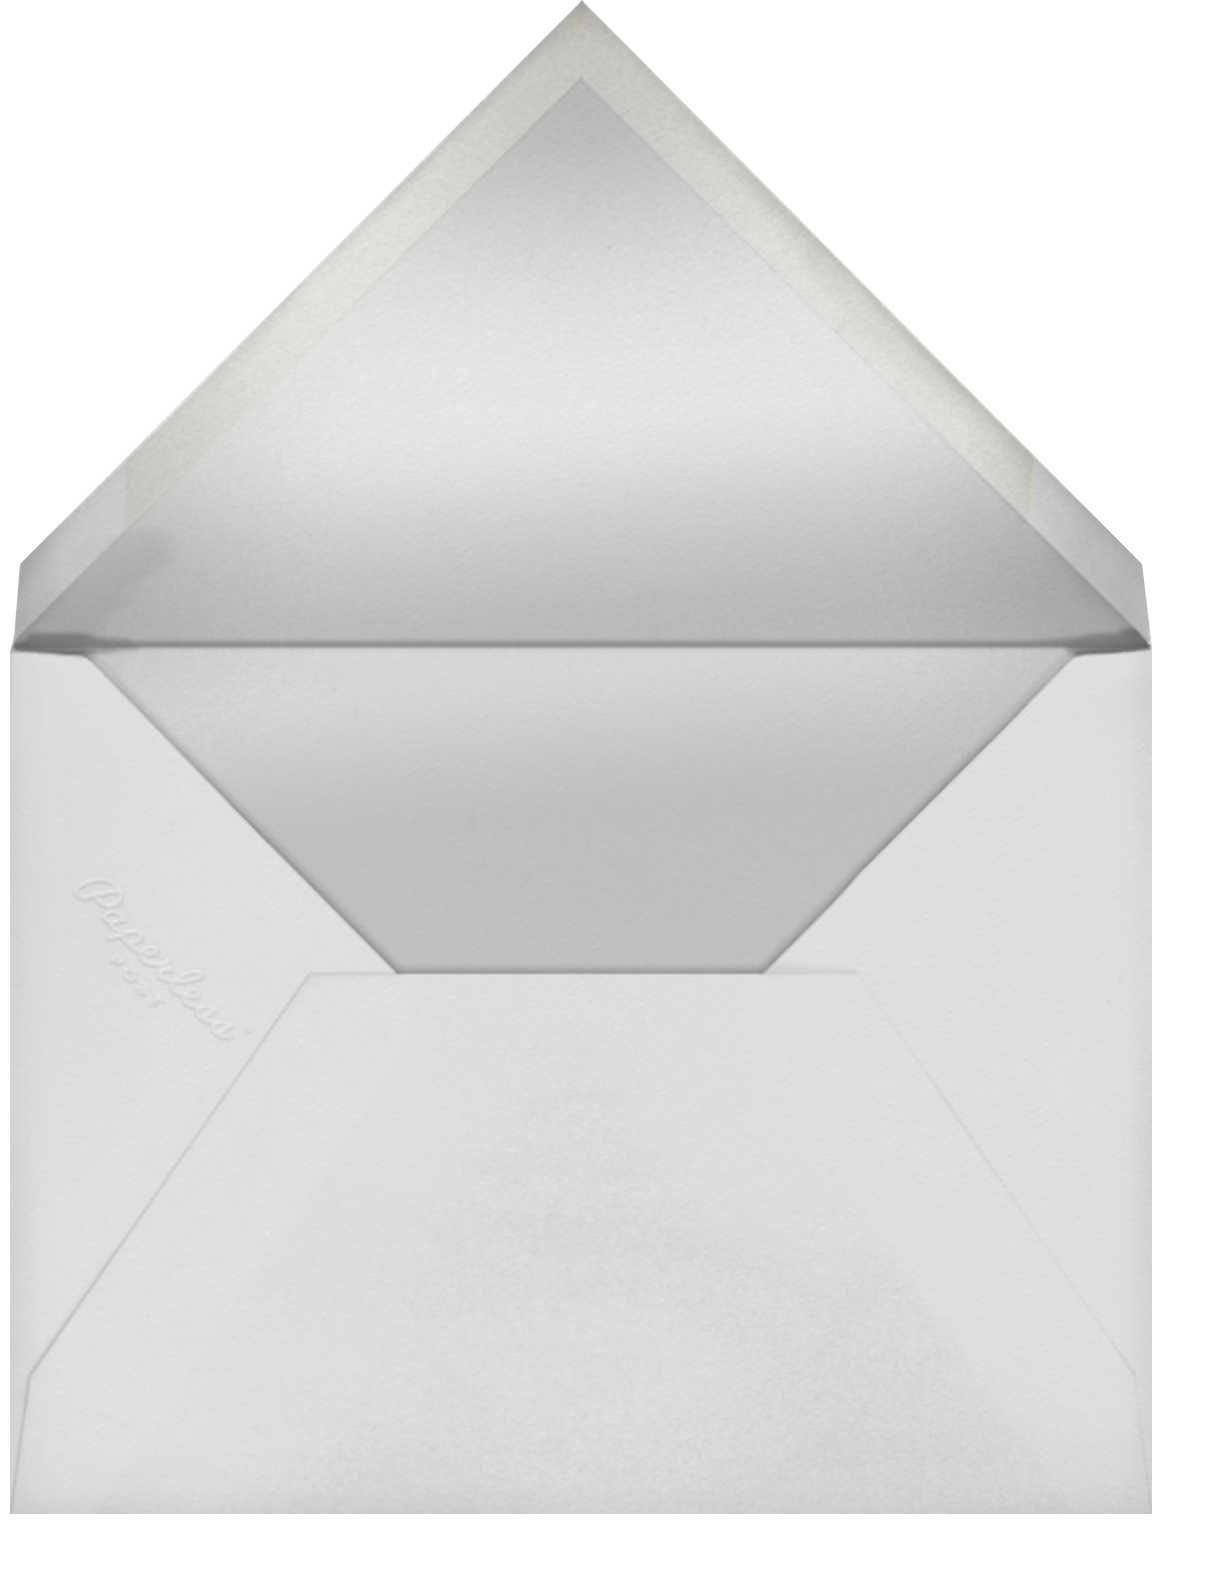 Chicago Skyline View (Menu) - Black/White - Paperless Post - Menus - envelope back